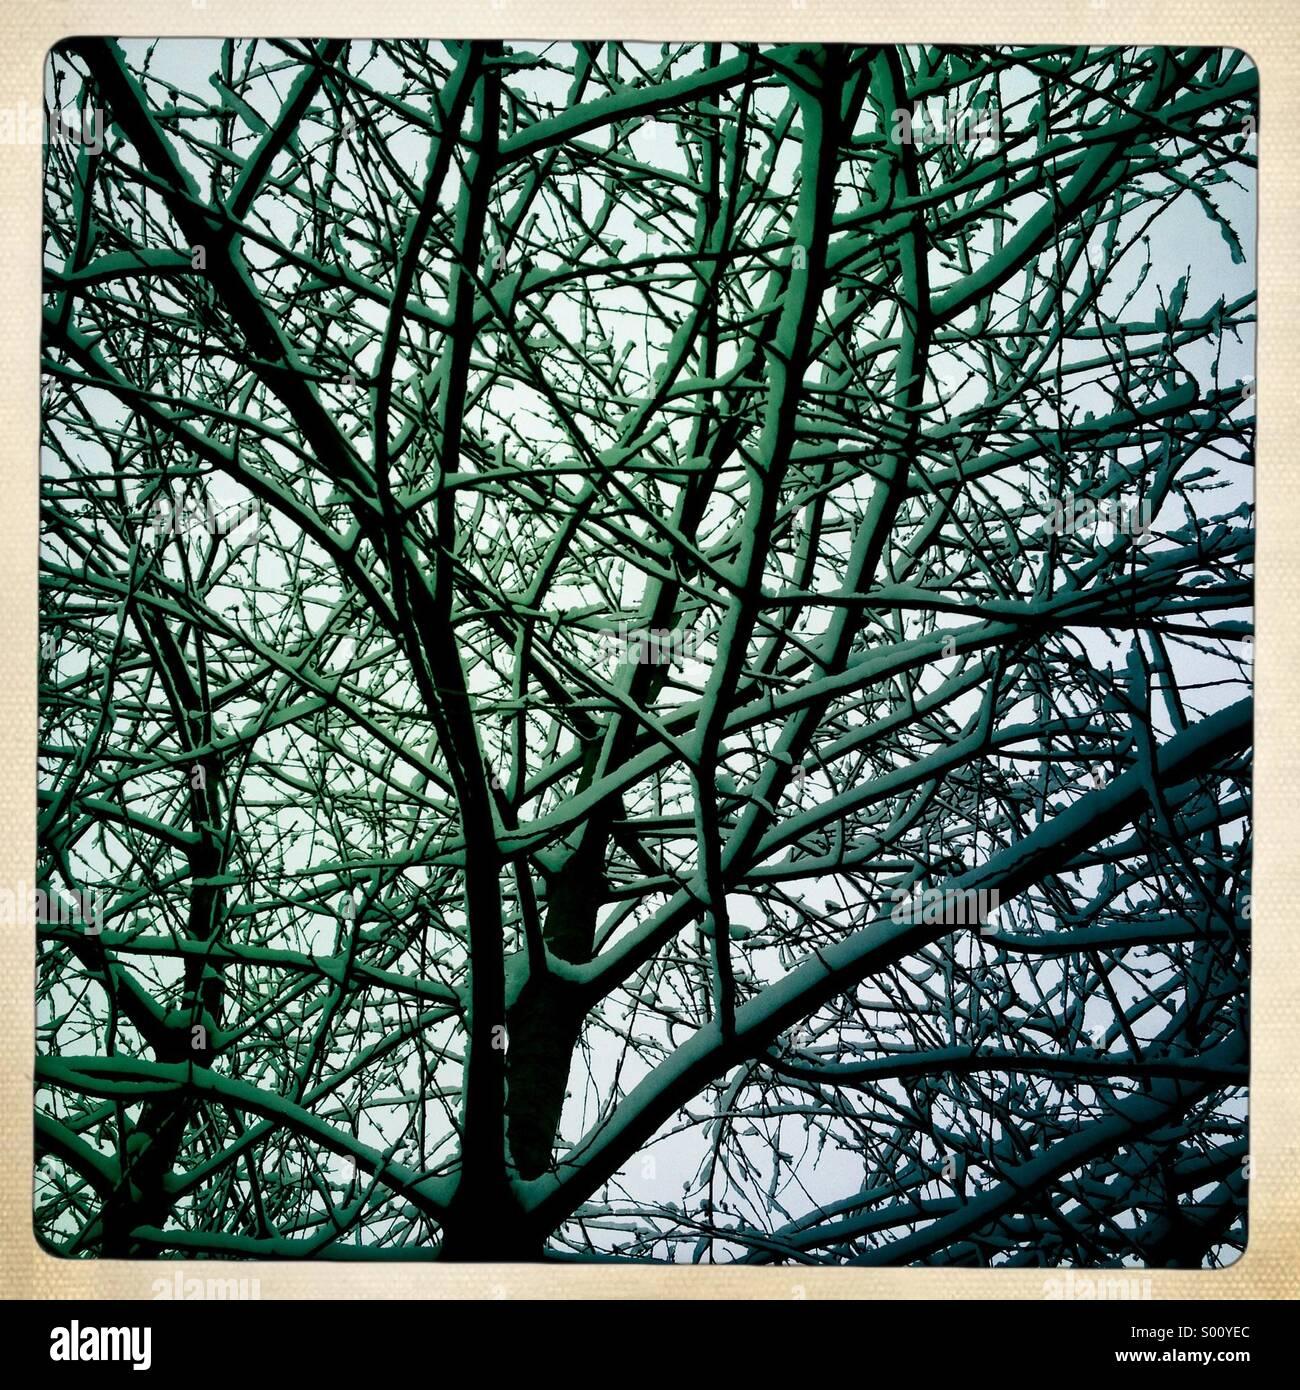 Snow in tree - Stock Image